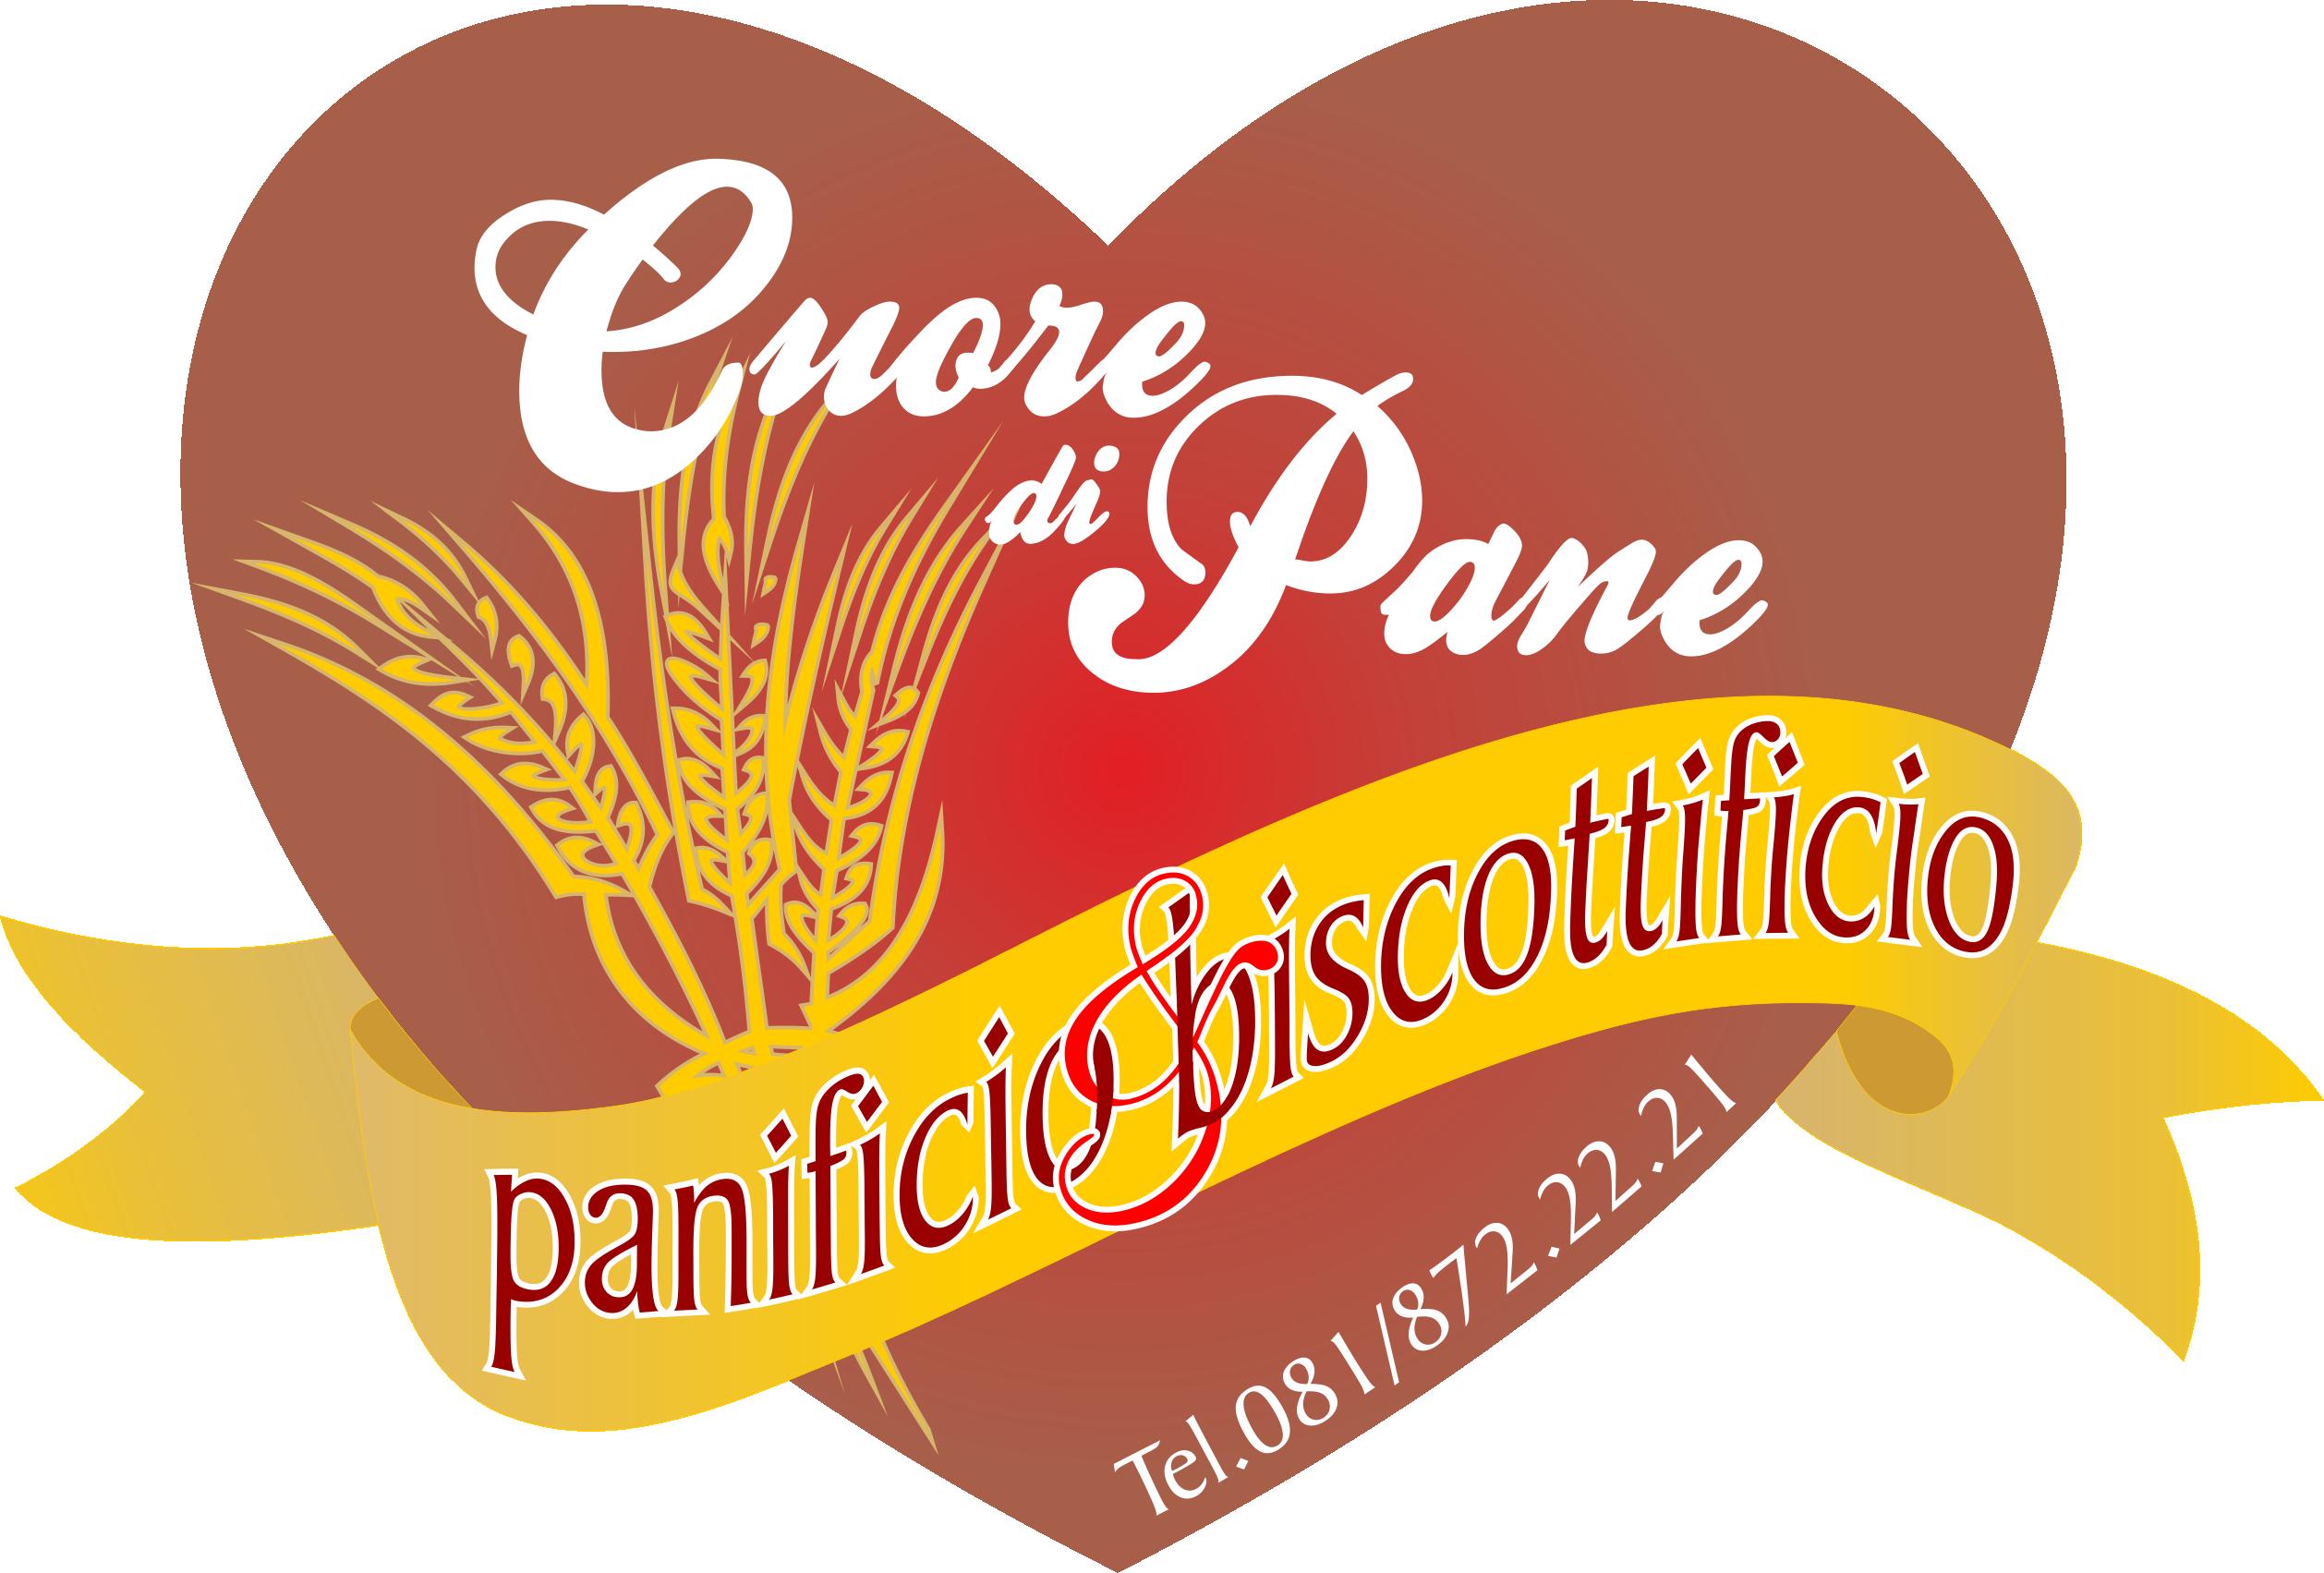 Cuore di Pane